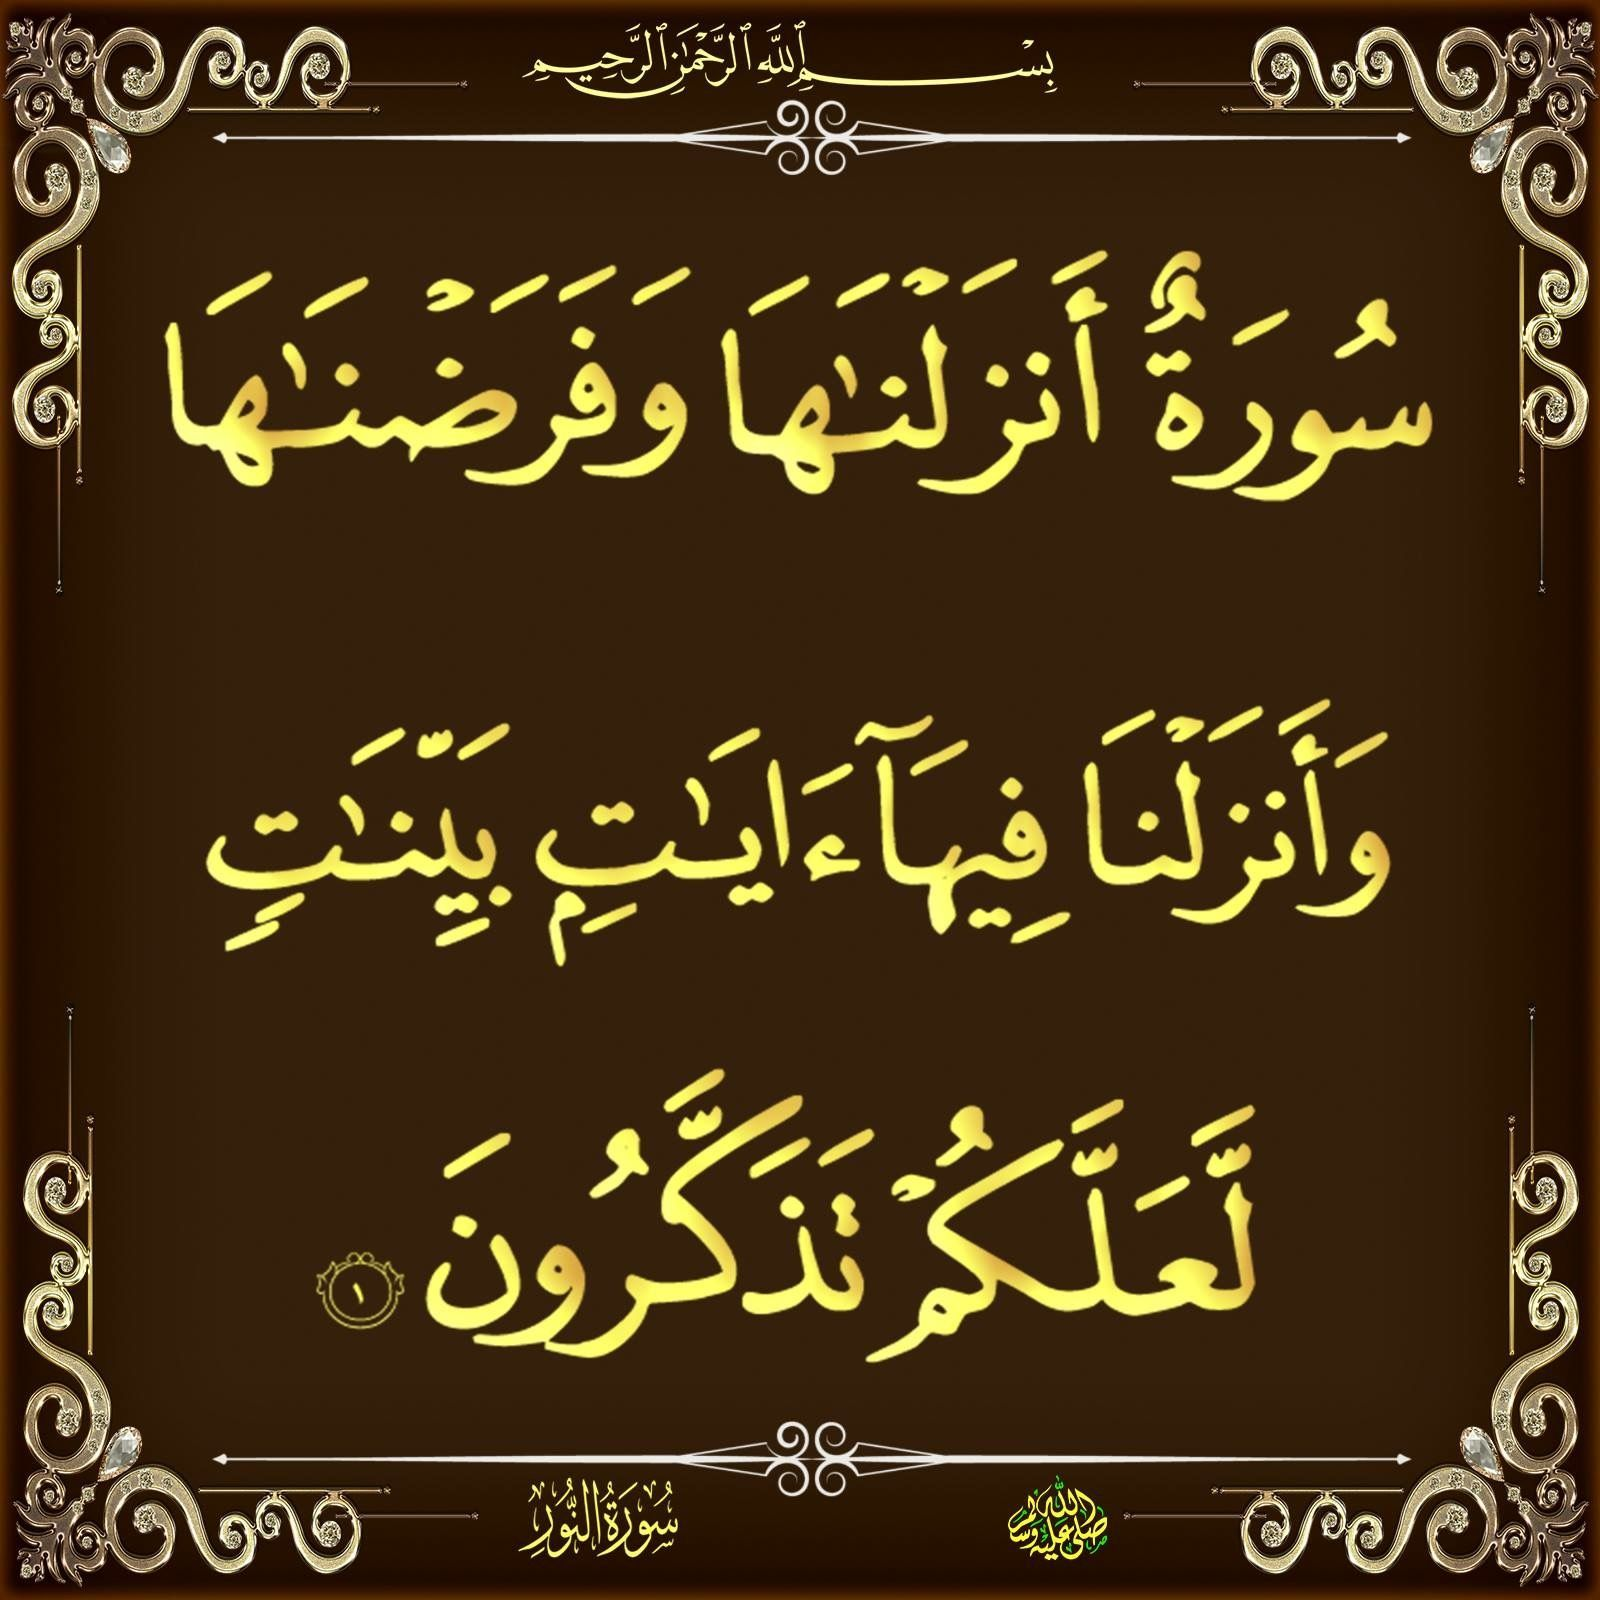 Pin By Hatem Mekni On 024 سورة النور In 2020 Calligraphy Arabic Calligraphy Arabic